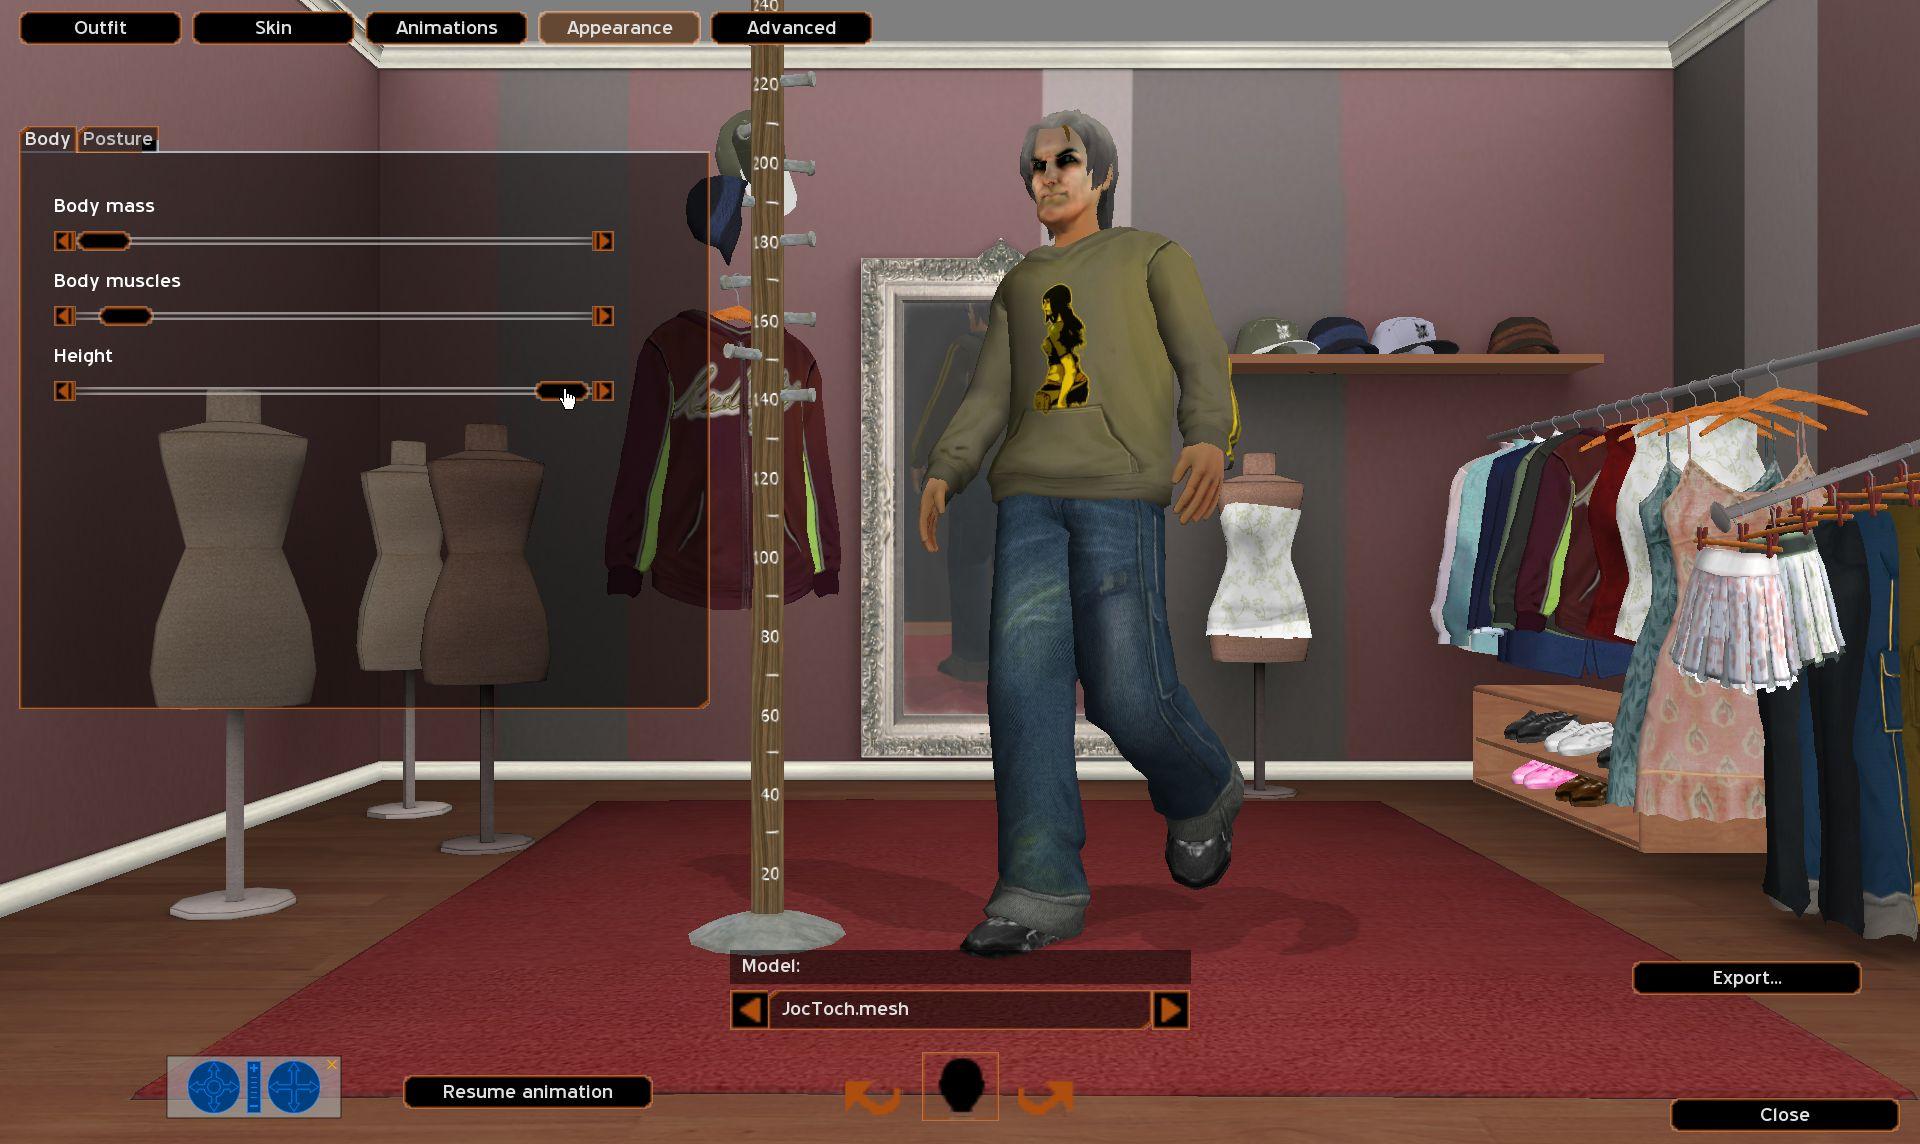 avatar2_screenshot_02